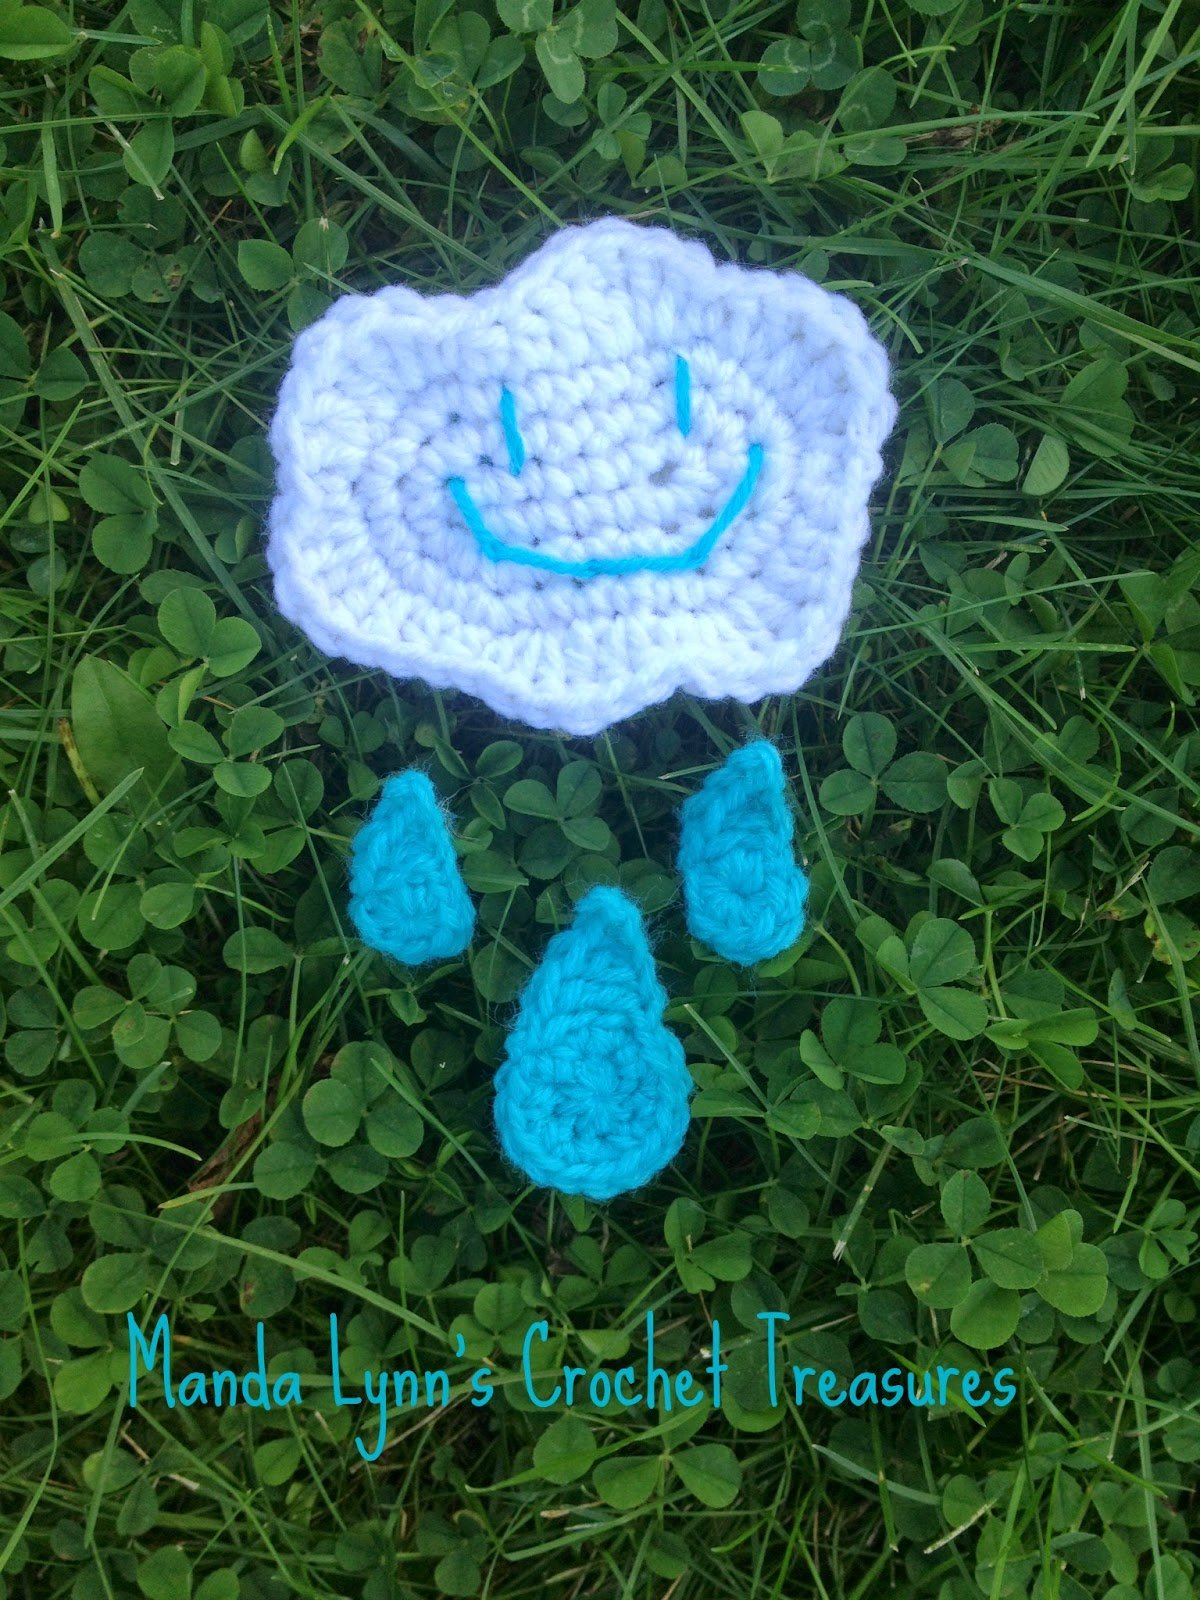 Stormy Cloud & Rain Drop Applique Set ~ Manda Proell - MandaLynn's Crochet Treasures